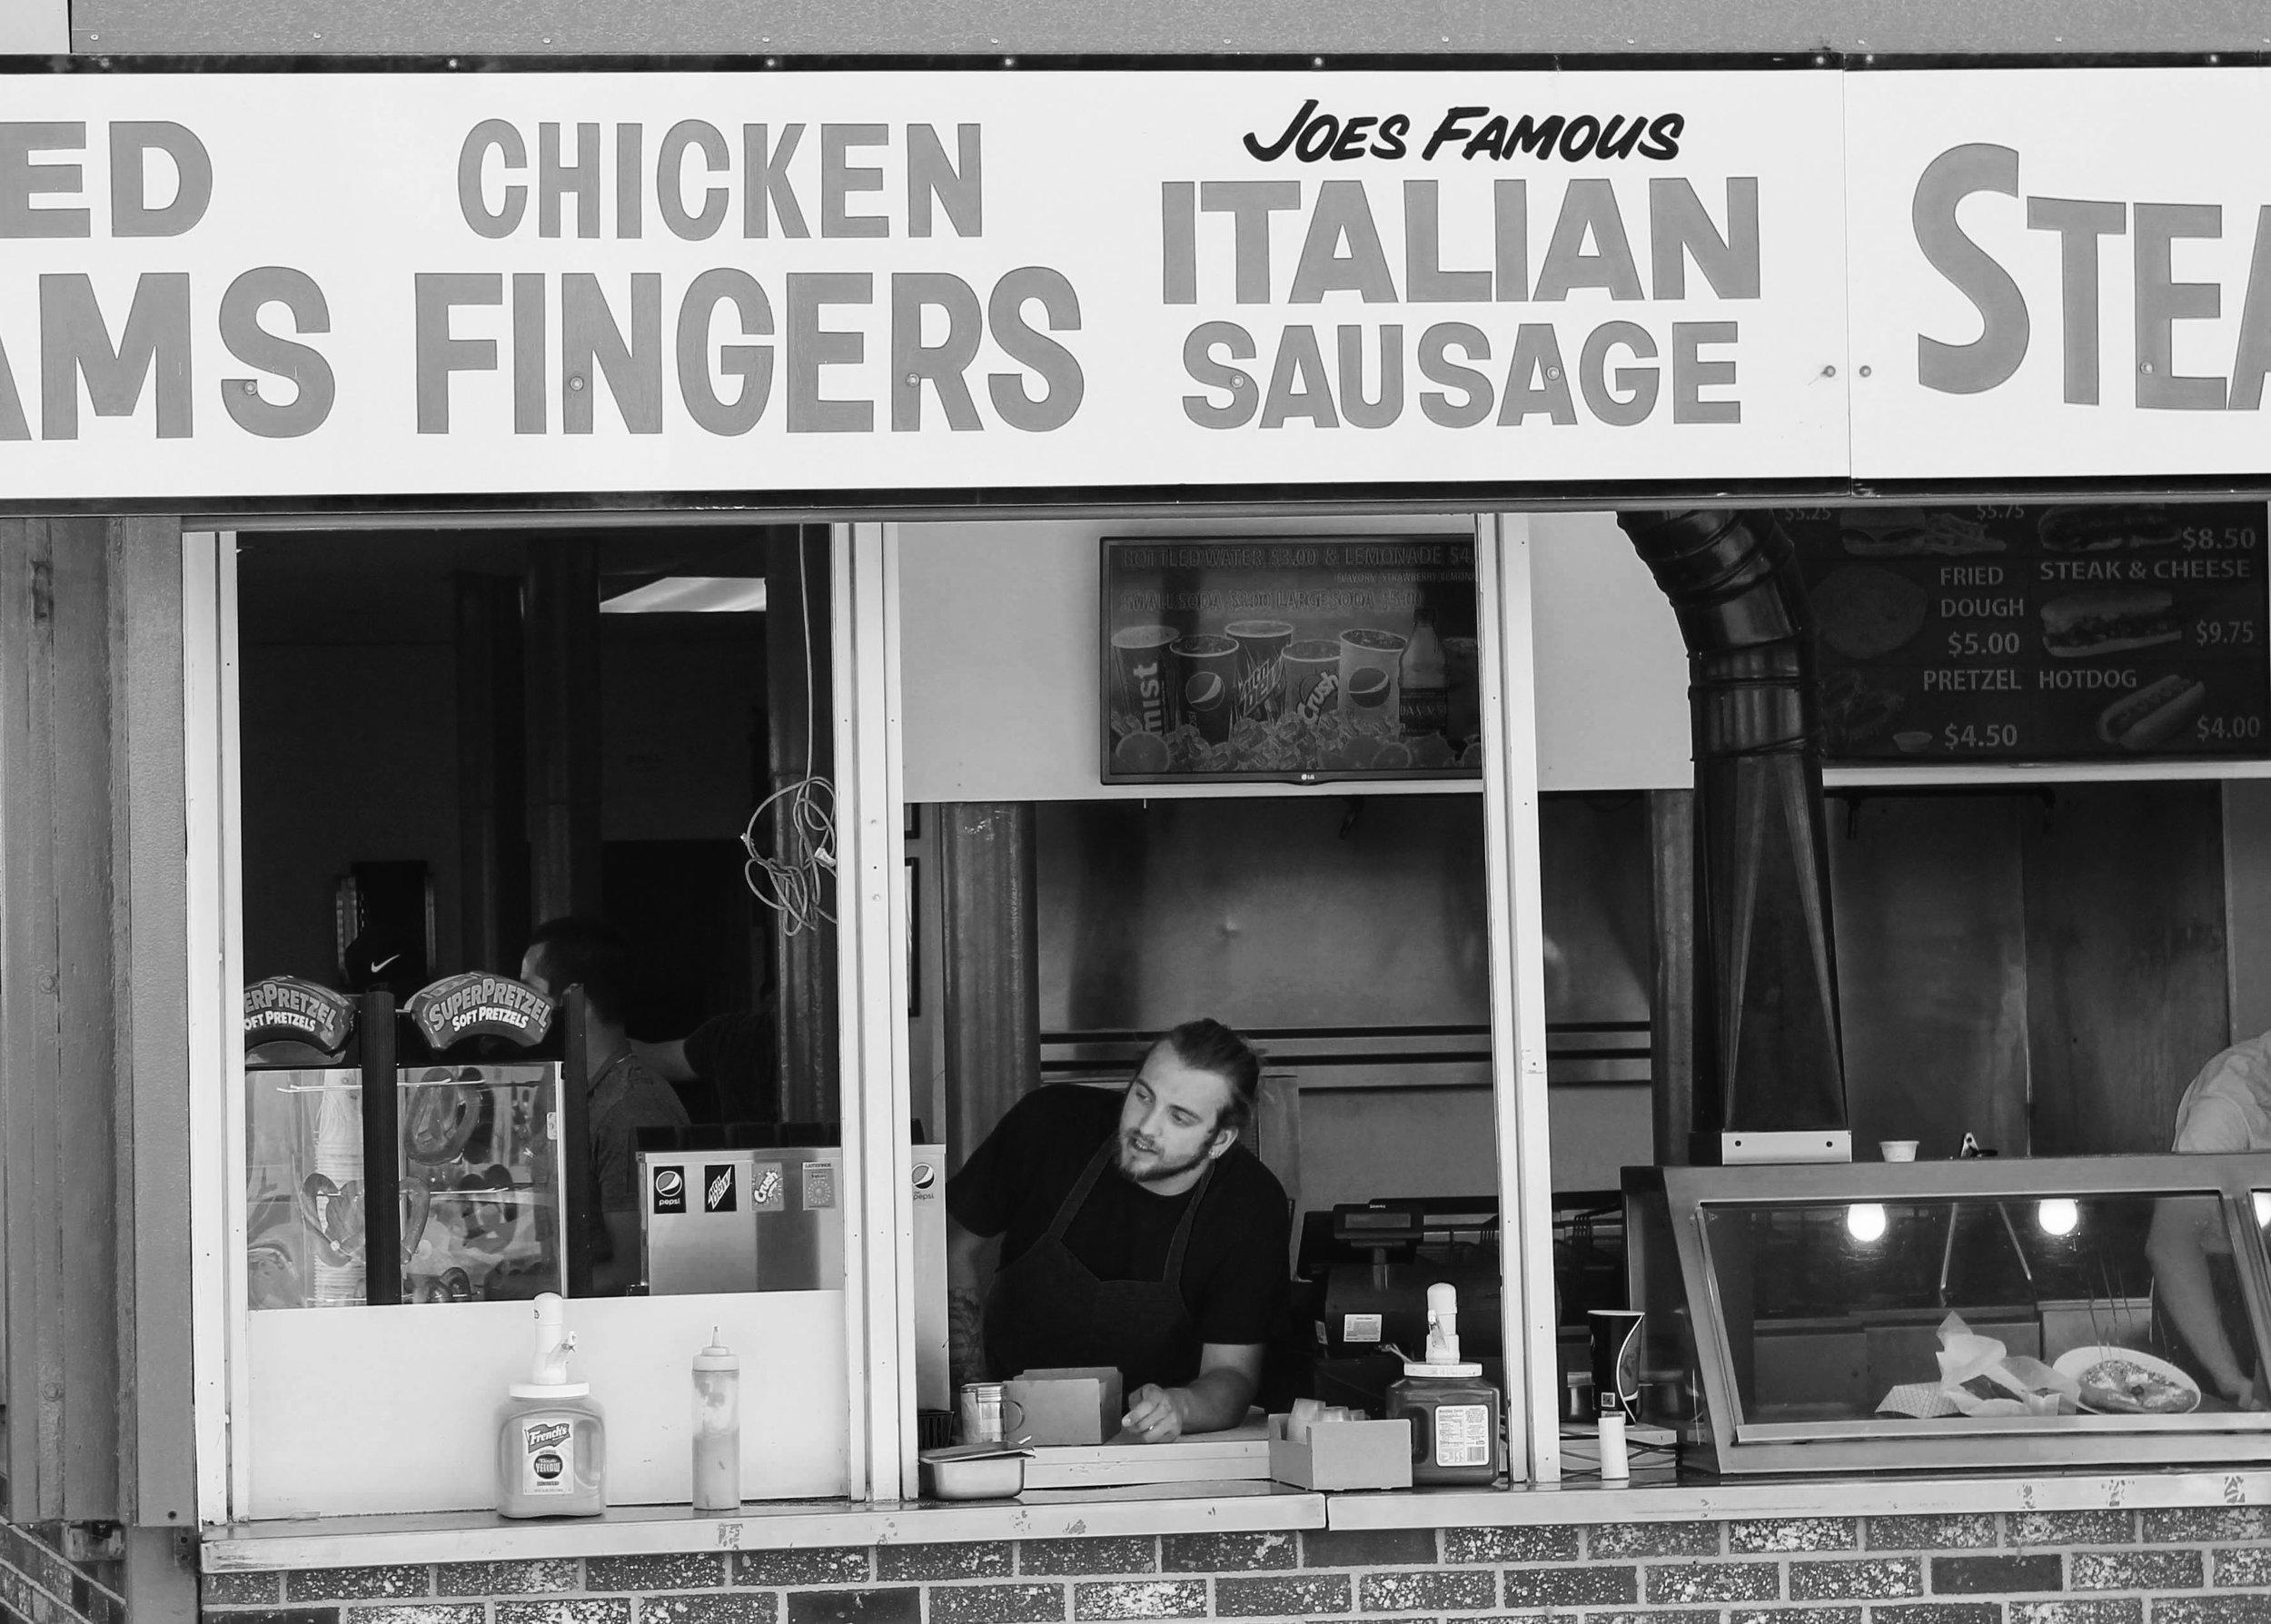 joes-famous-italian-sausage